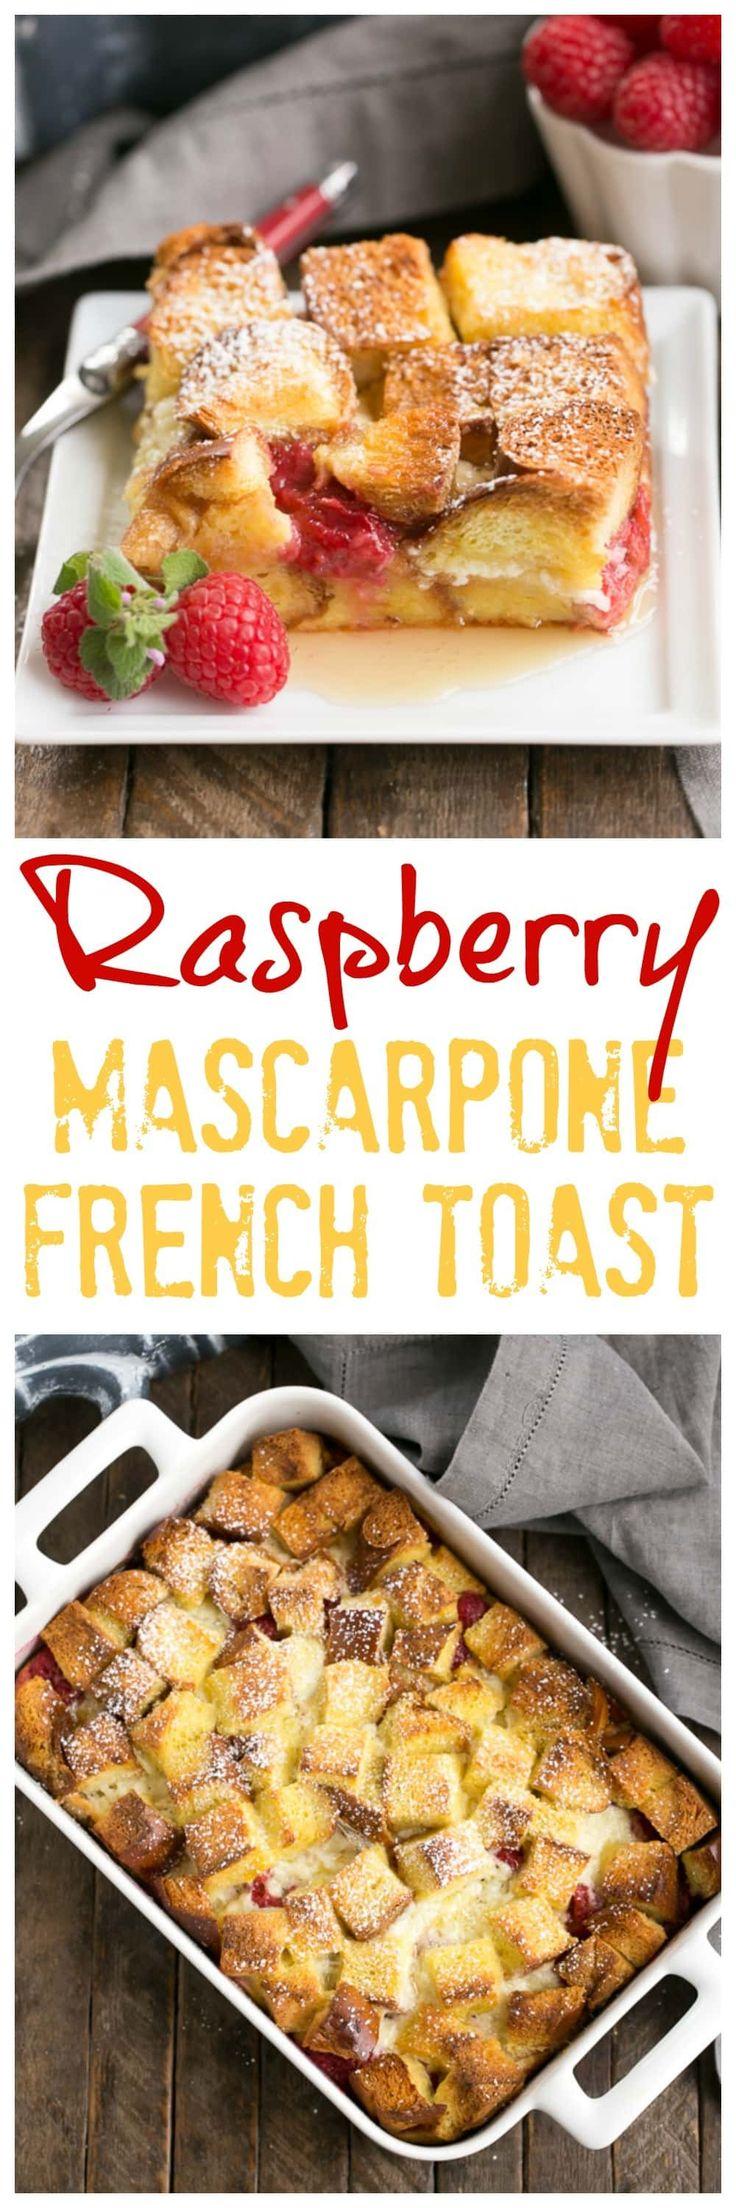 Raspberry Mascarpone French Toast Casserole   A delectable, make ahead breakfast strata filled with mascarpone cream and fresh raspberries @lizzydo